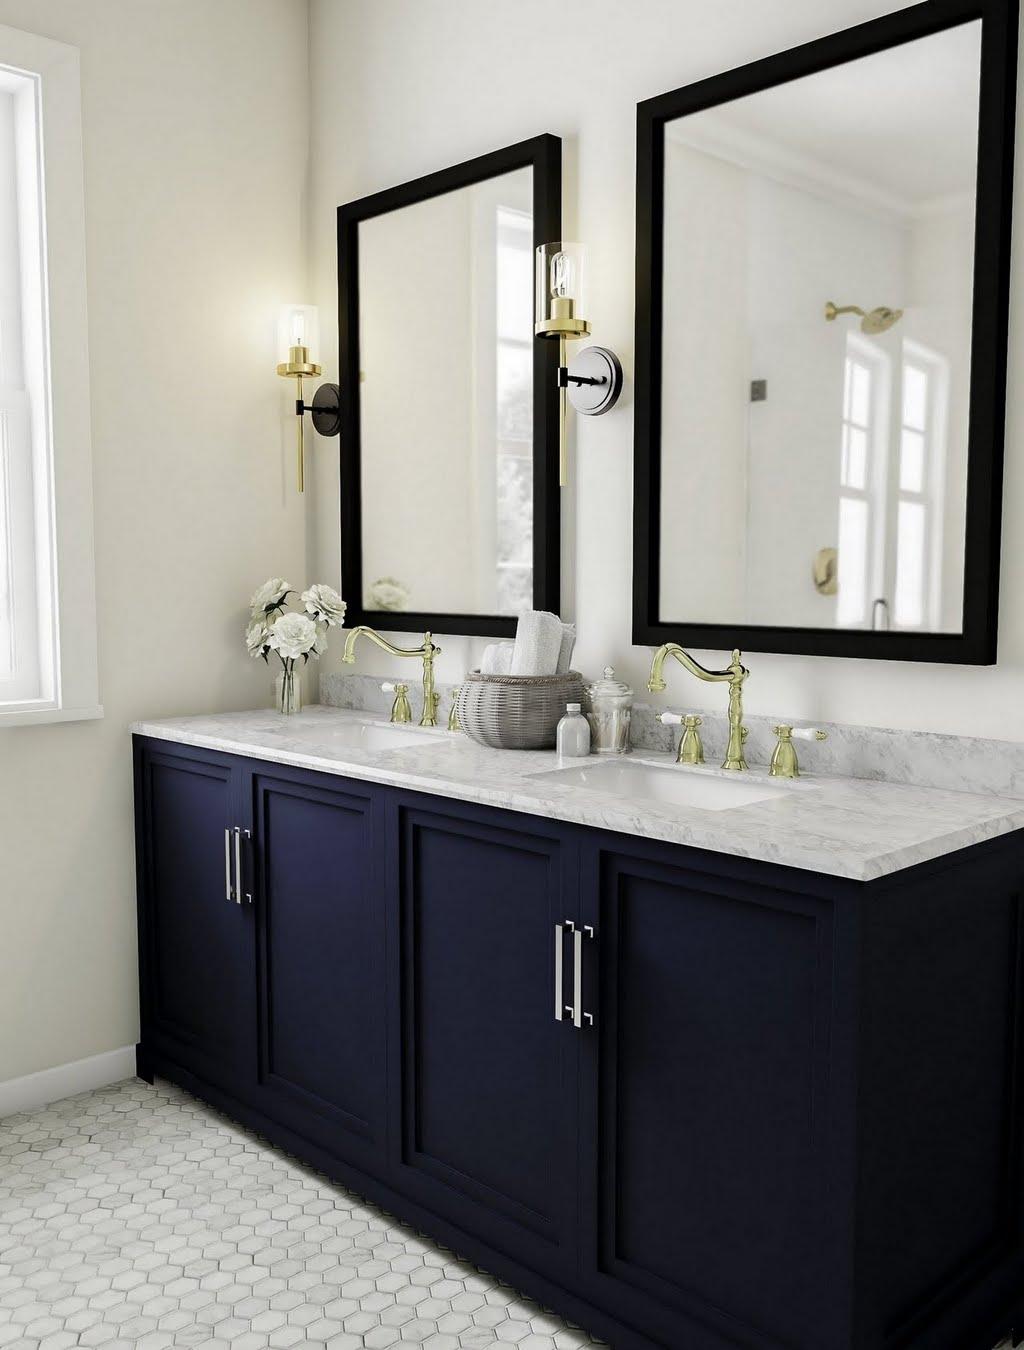 Traditional Bathroom With Dark Blue Vanity Bathroom The Home Depot